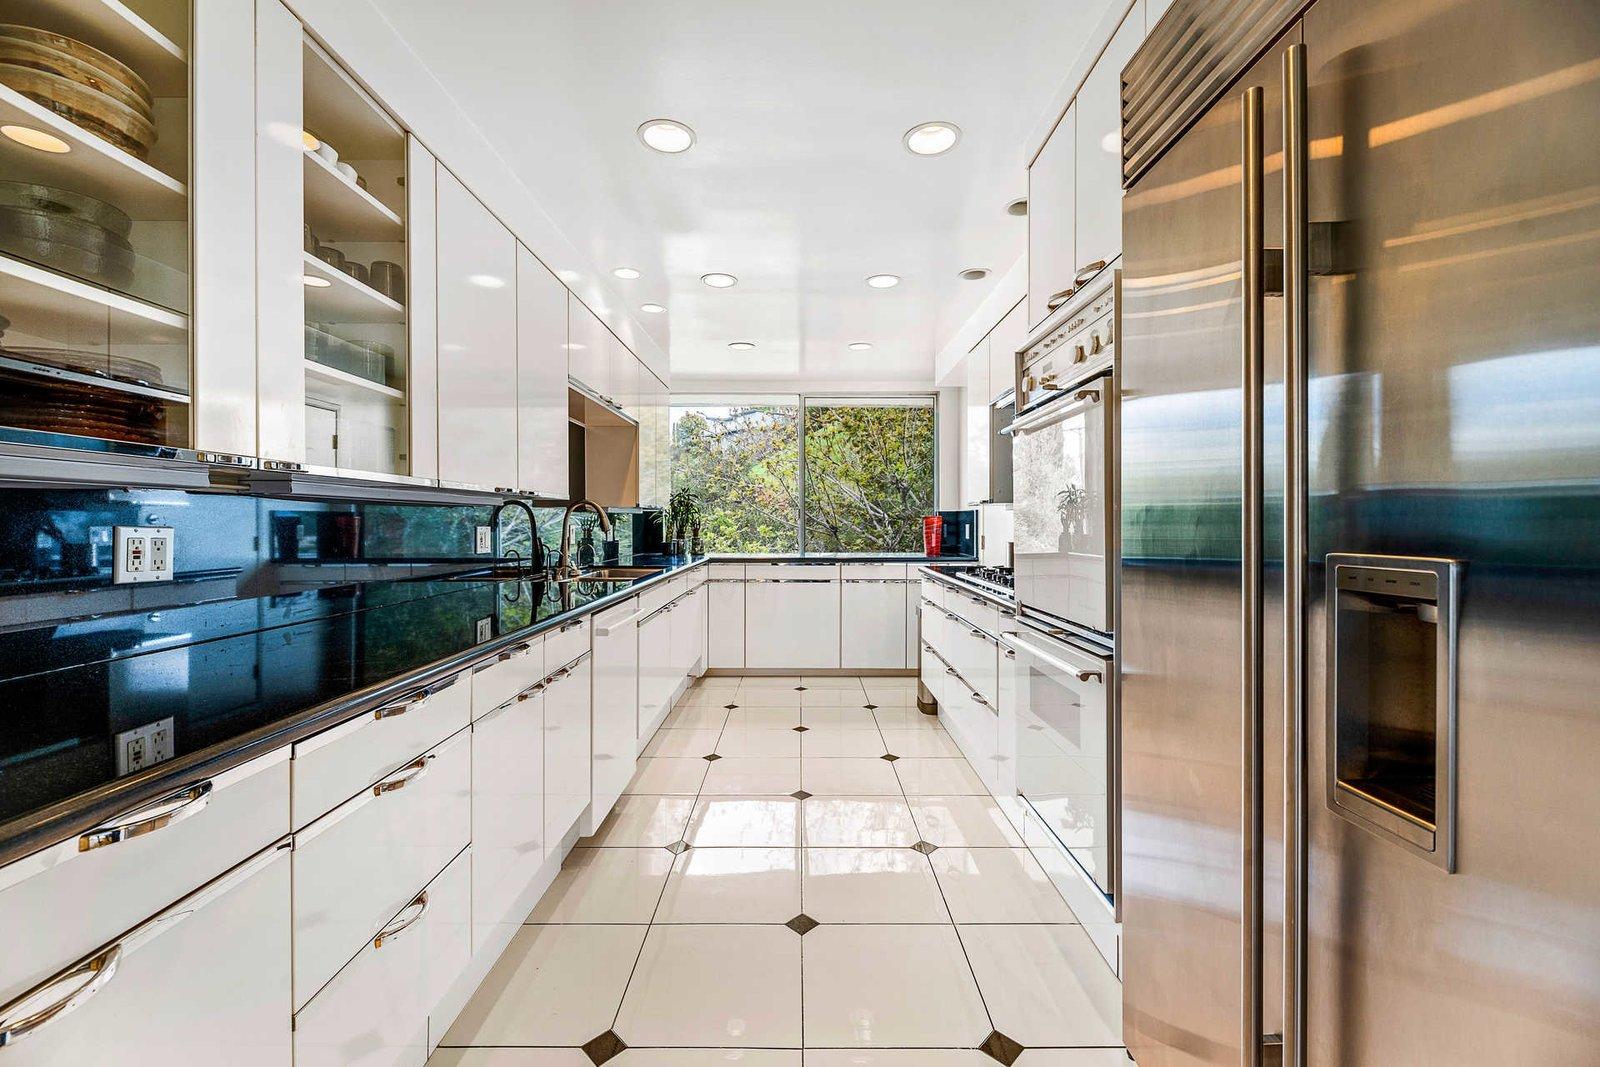 Richard Neutra Platform House kitchen